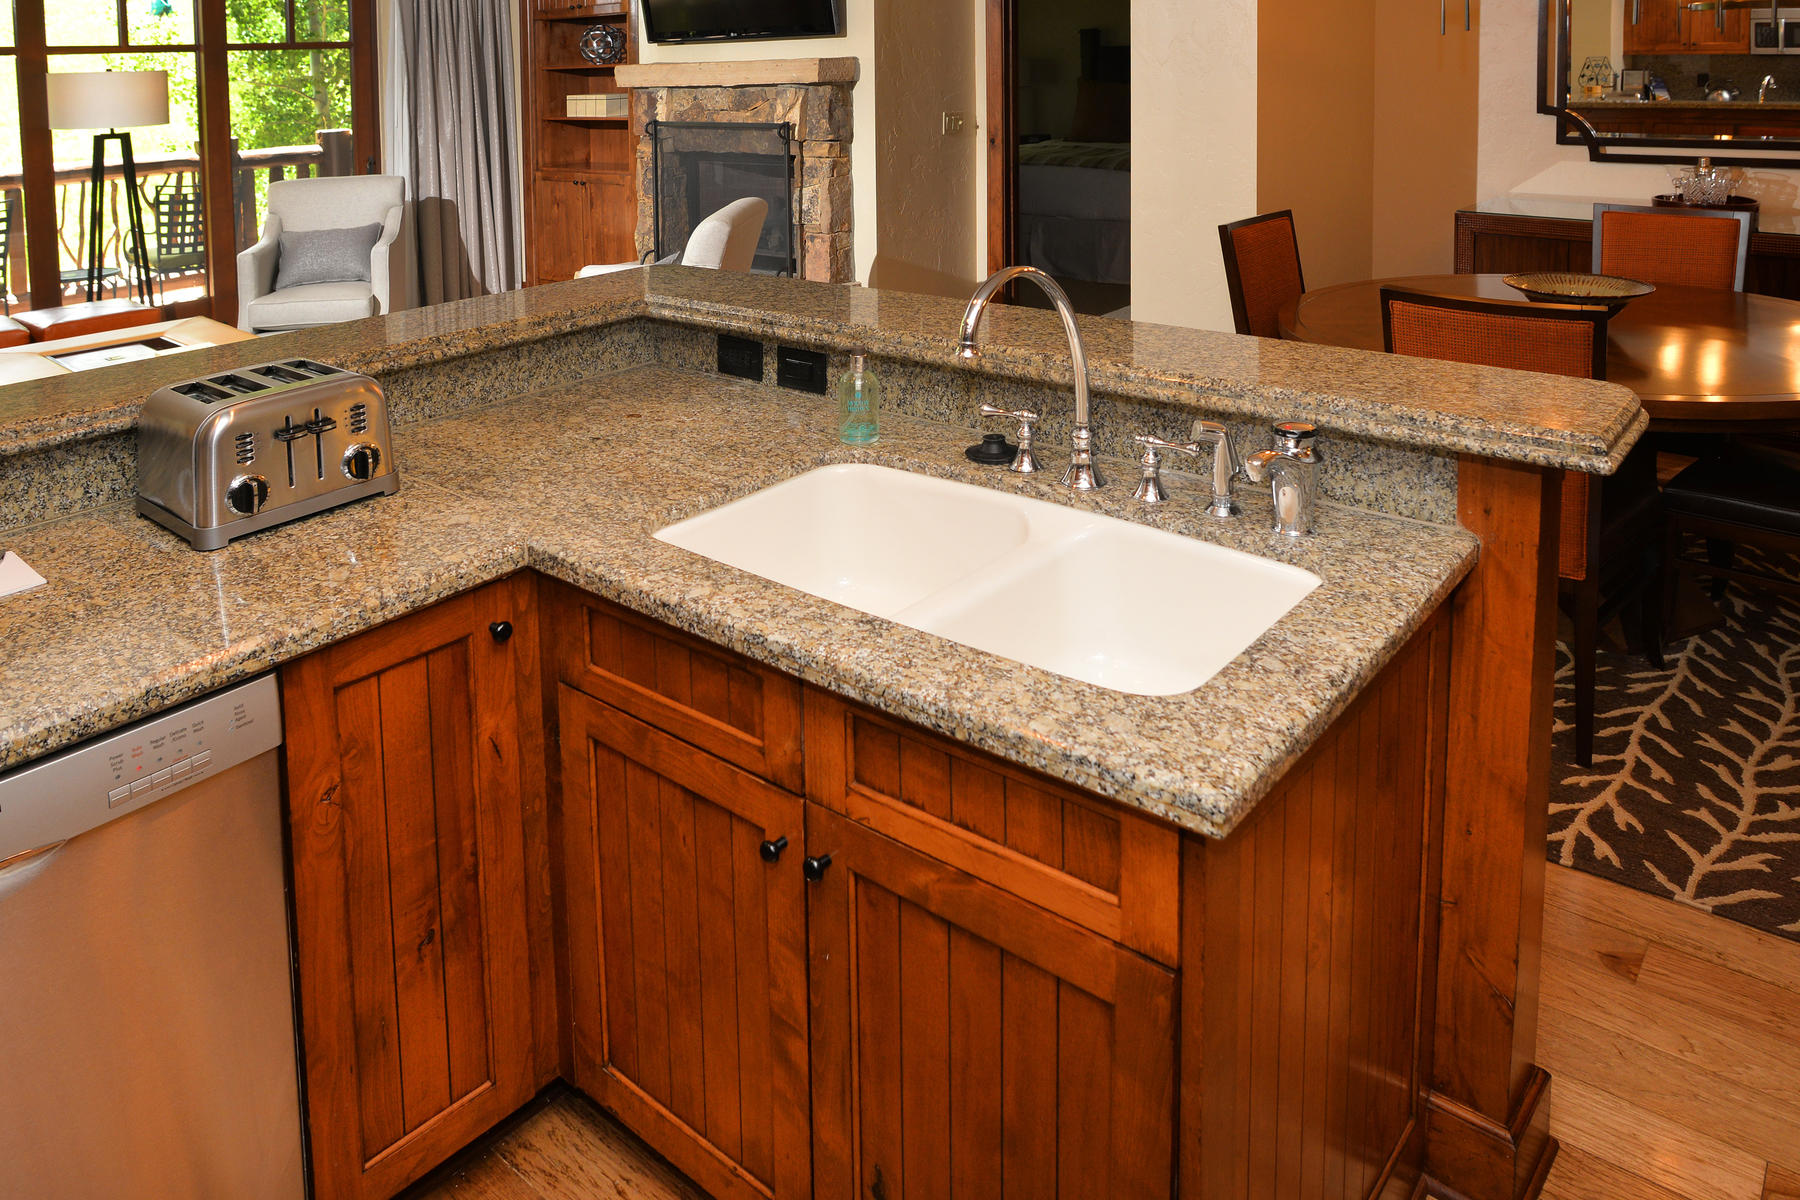 Additional photo for property listing at Bachelor Gulch Ski-in/Ski-out 100 Bachelor Ridge #3310-09 Avon, Colorado 81620 Estados Unidos